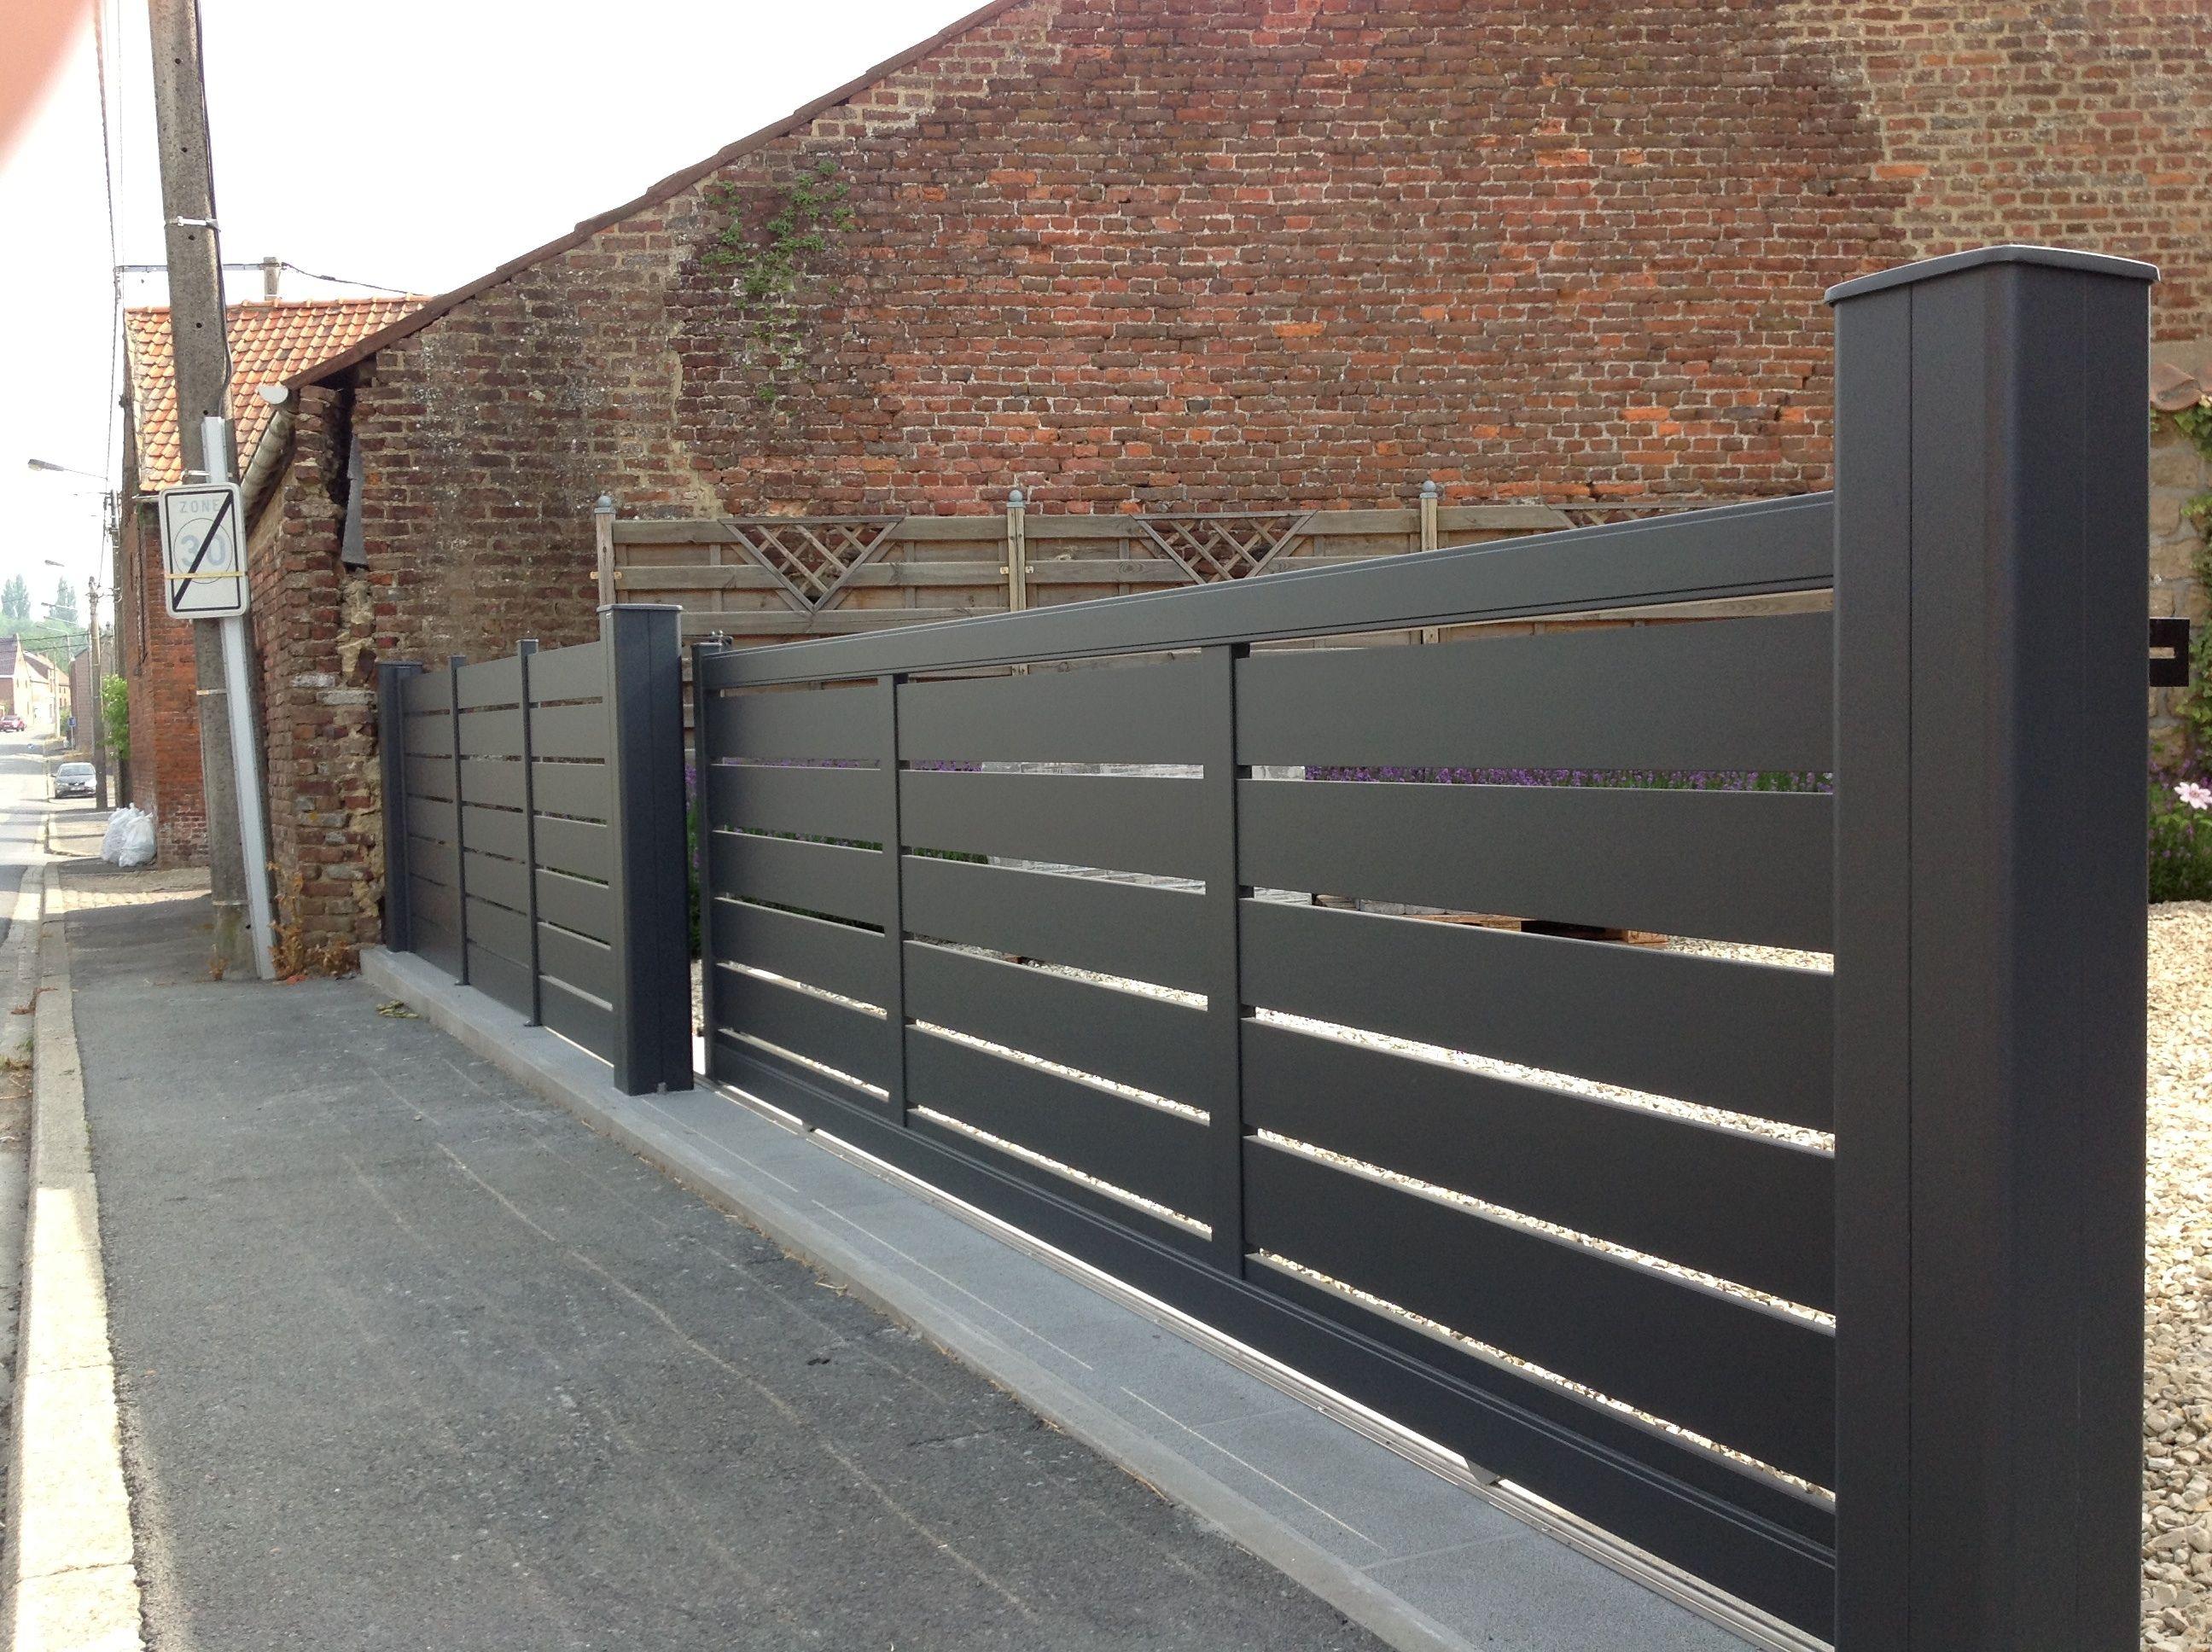 portail coulissant maez et palissade jpg 2592 1936 portail palissade pinterest portail. Black Bedroom Furniture Sets. Home Design Ideas